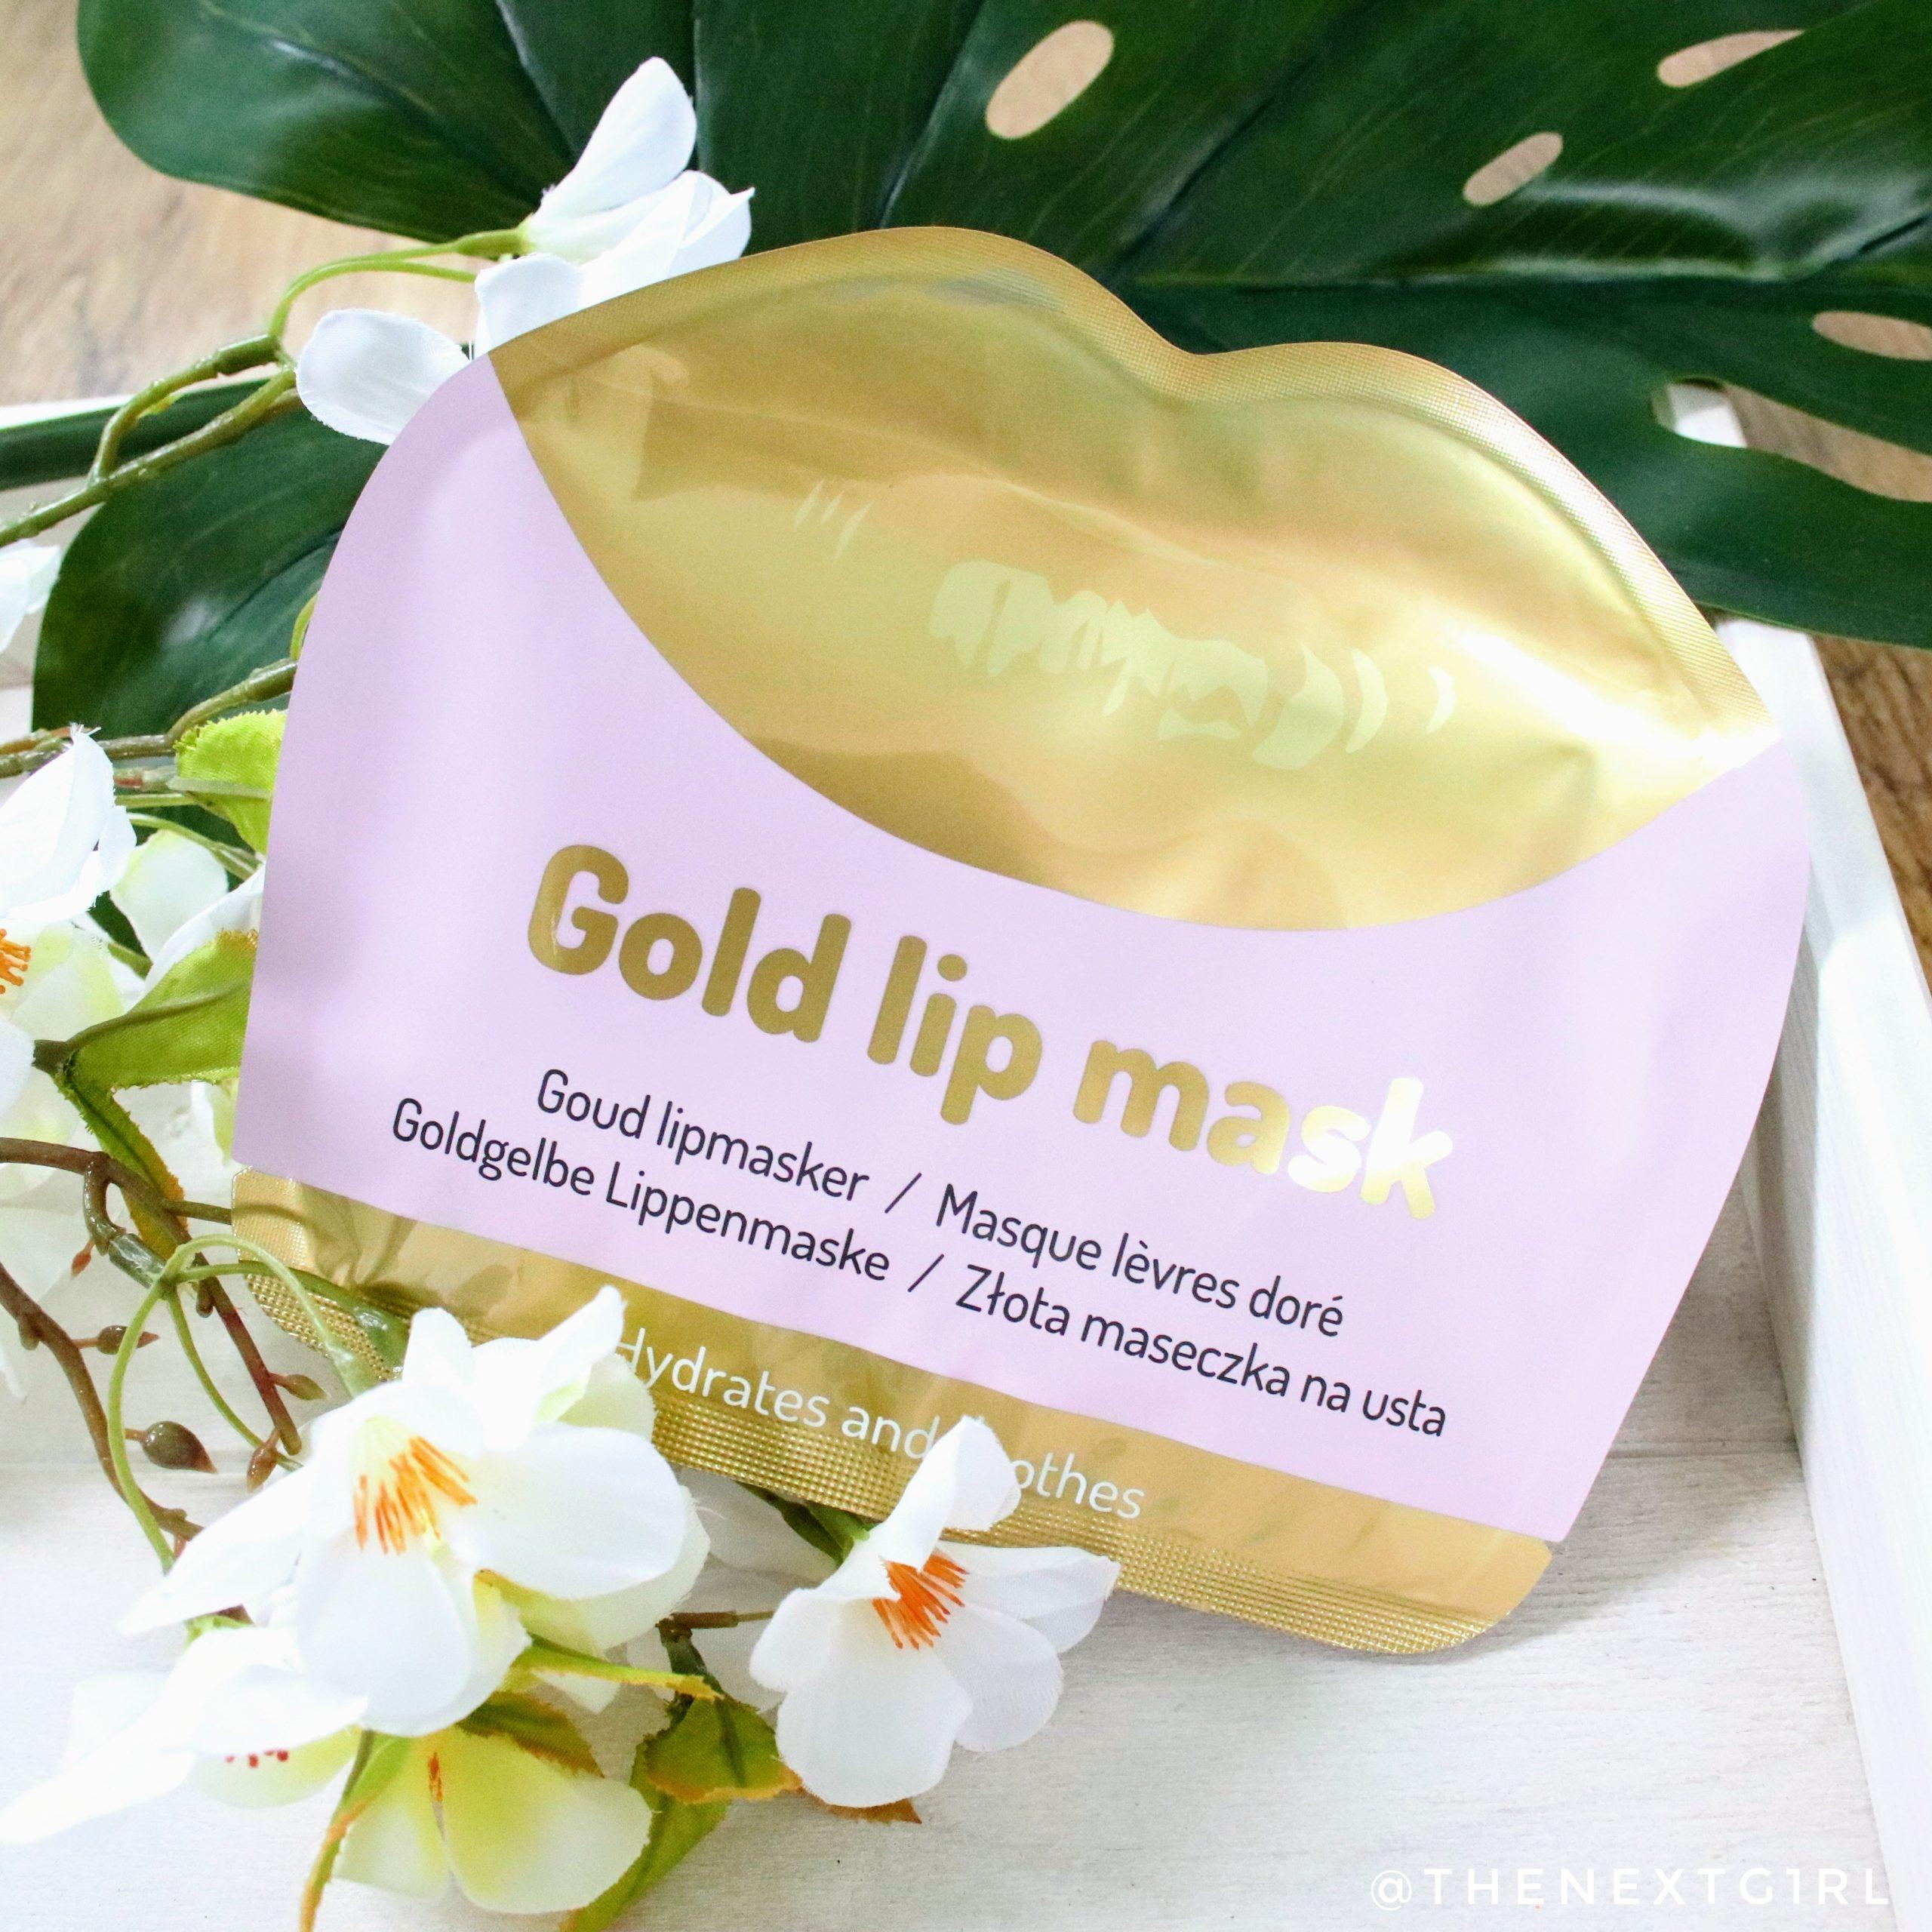 Gold lip mask van Action